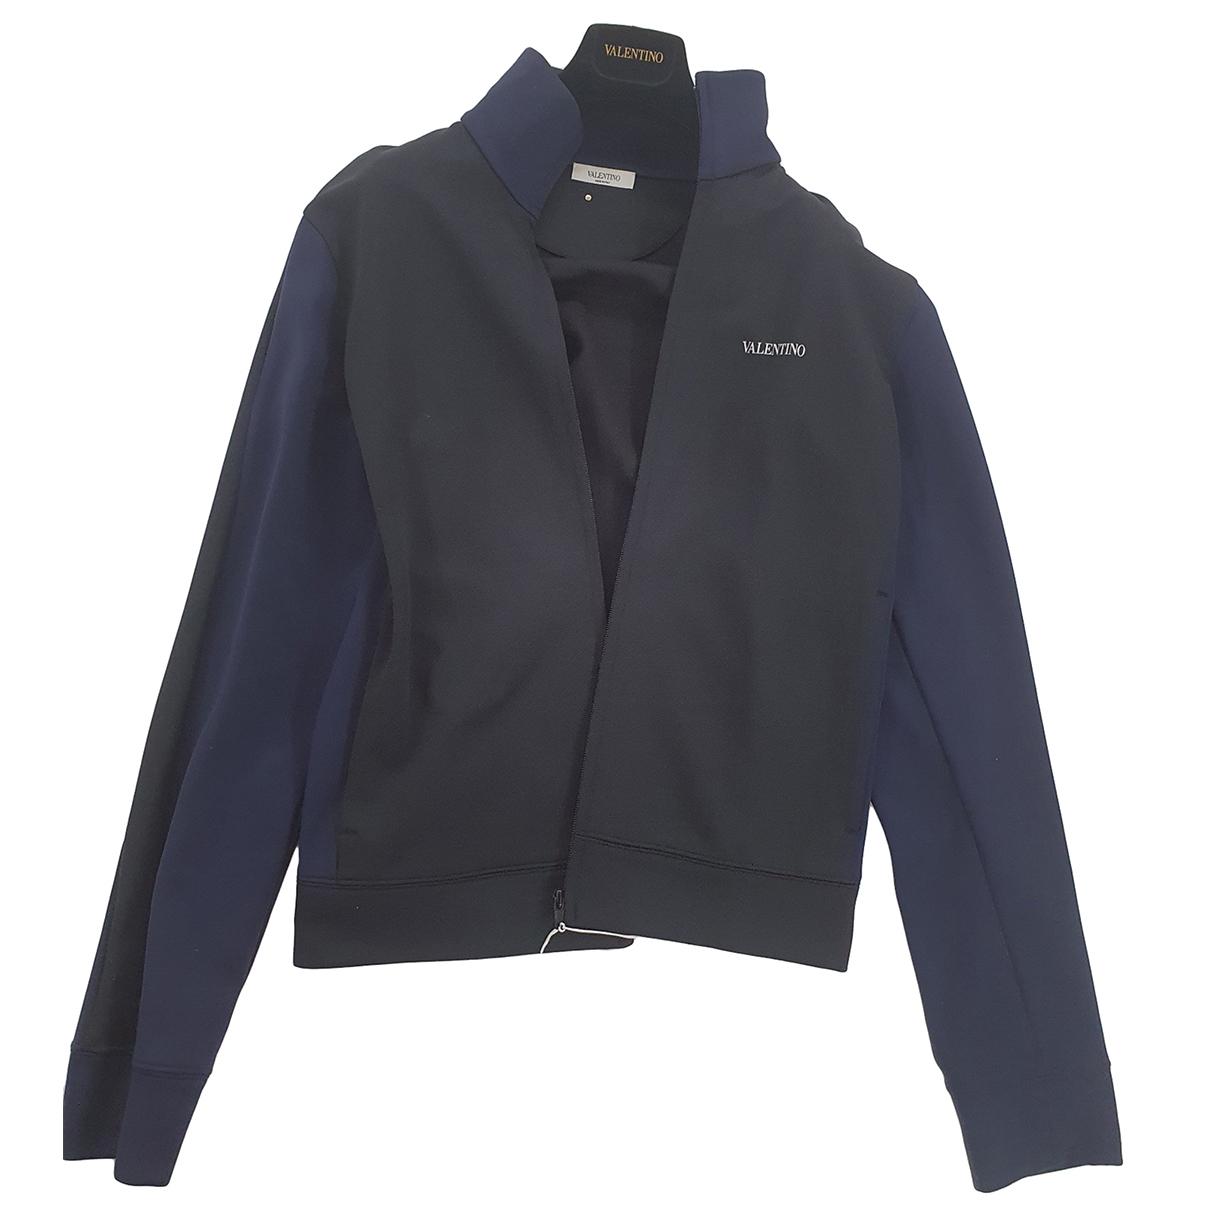 Valentino Garavani \N Black jacket  for Men M International